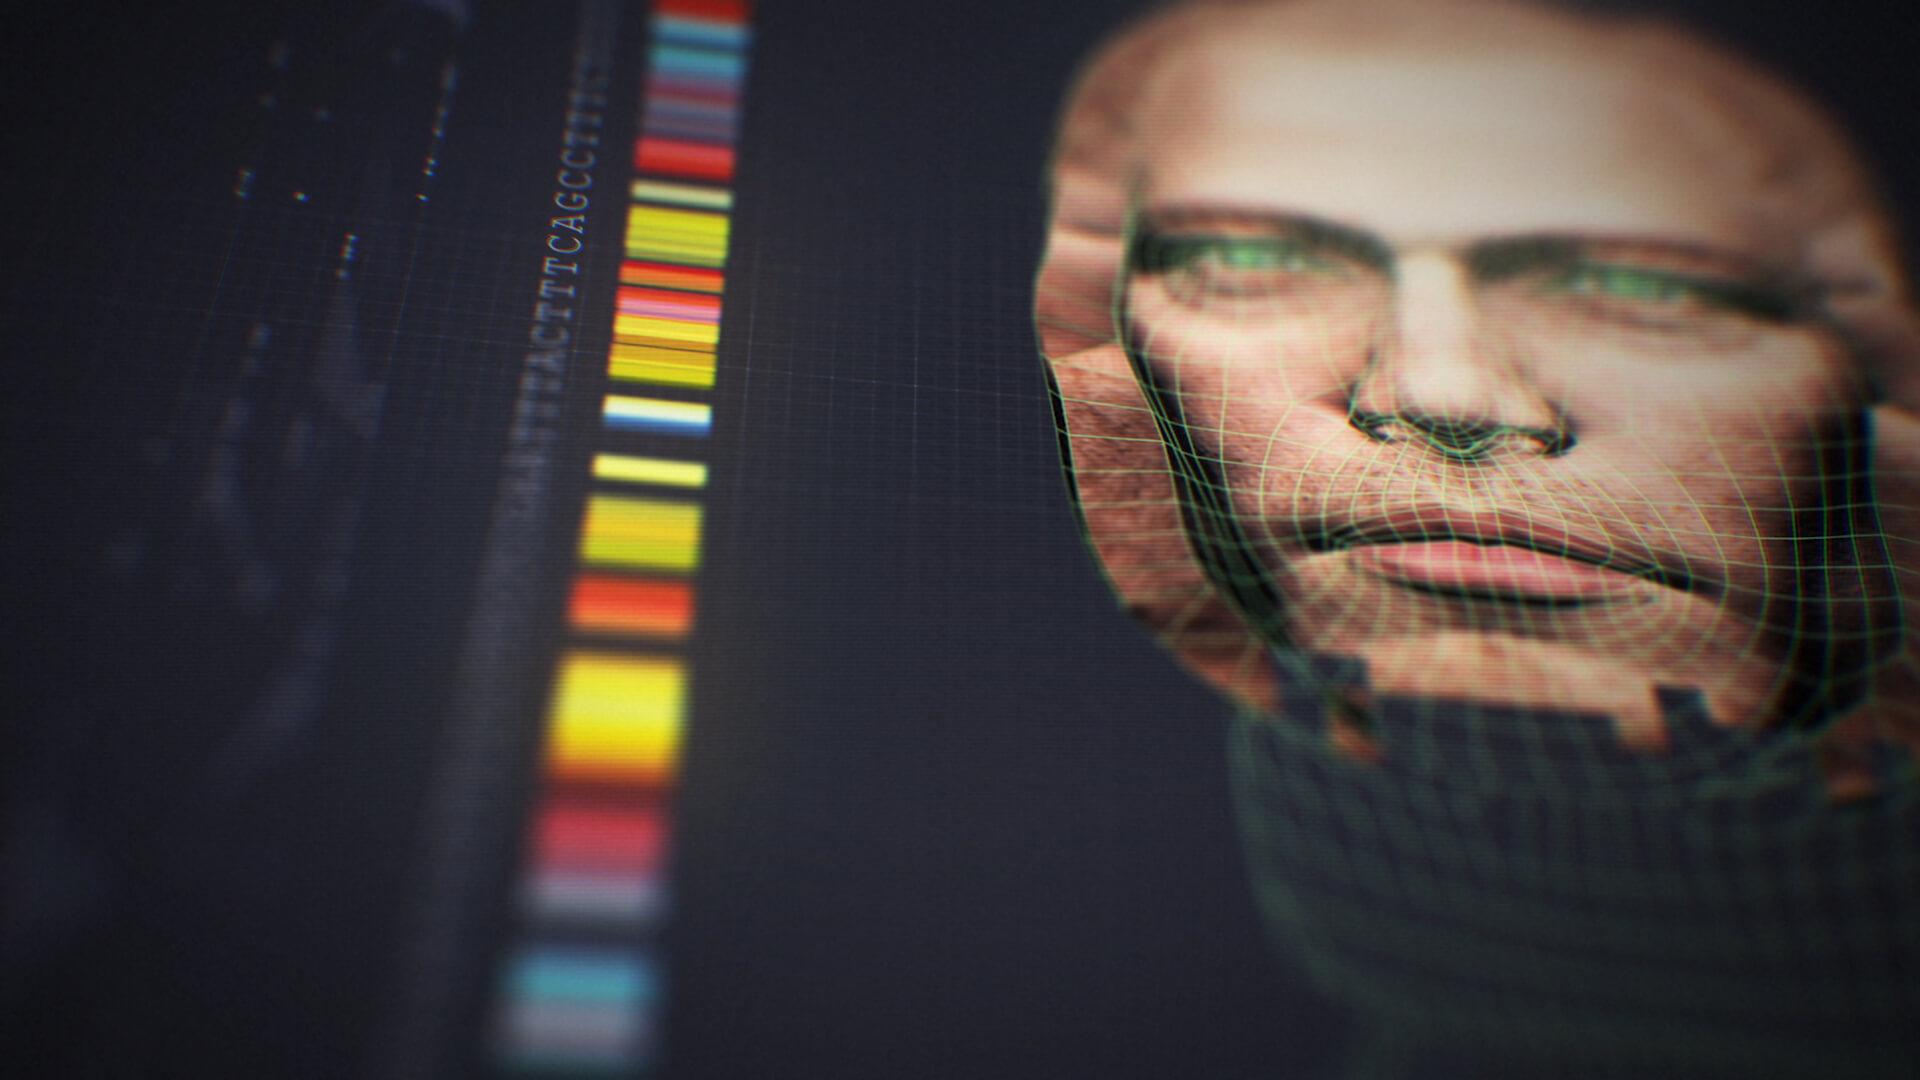 medical detectives facial recognition software